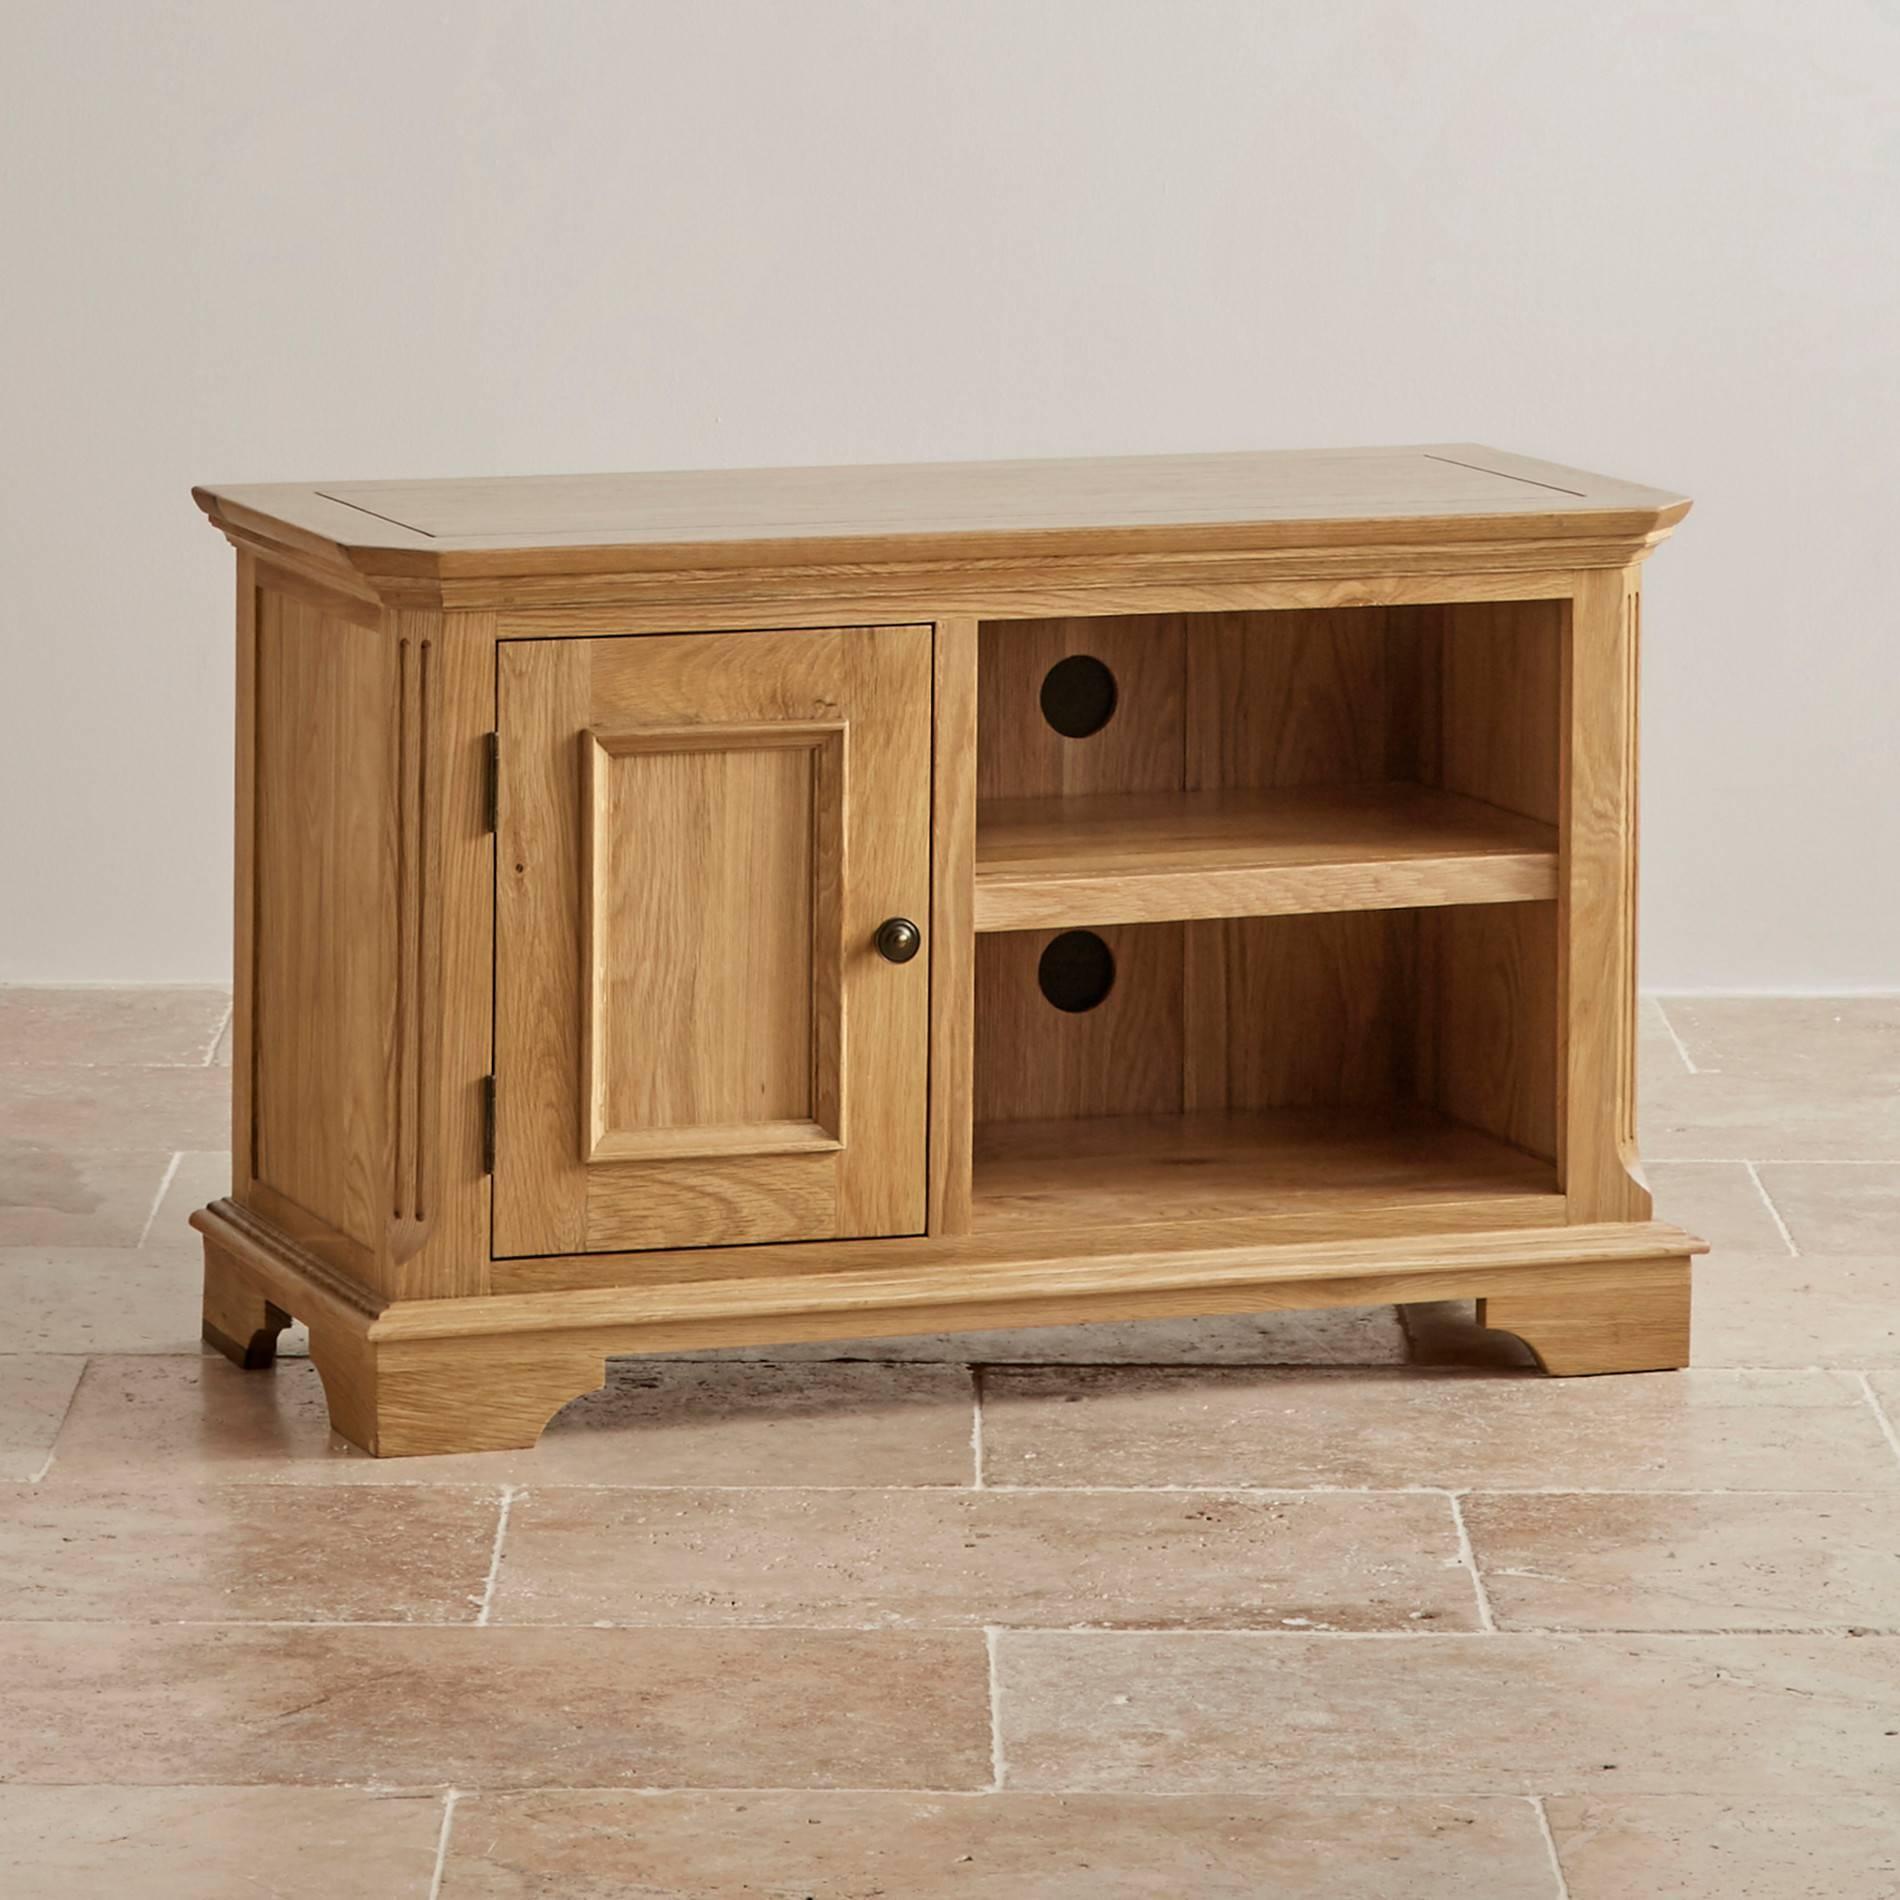 Edinburgh Small Tv Cabinet In Solid Oak | Oak Furniture Land in Small Oak Tv Cabinets (Image 3 of 15)